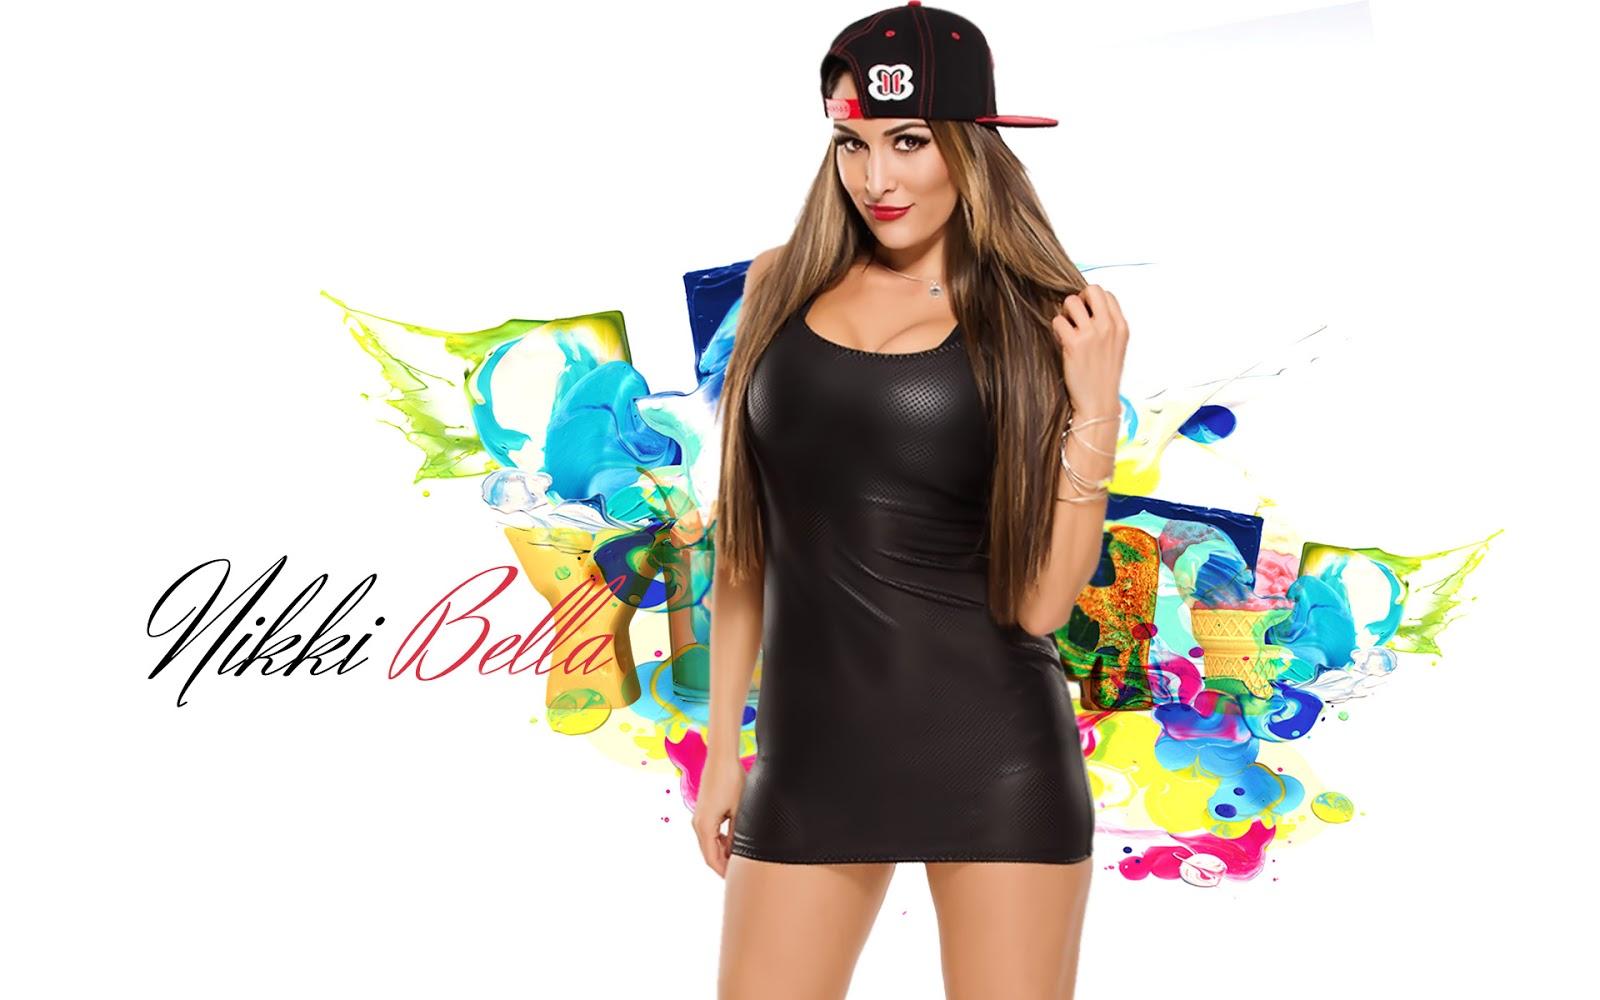 Sexy Pics Of Nikki Bella